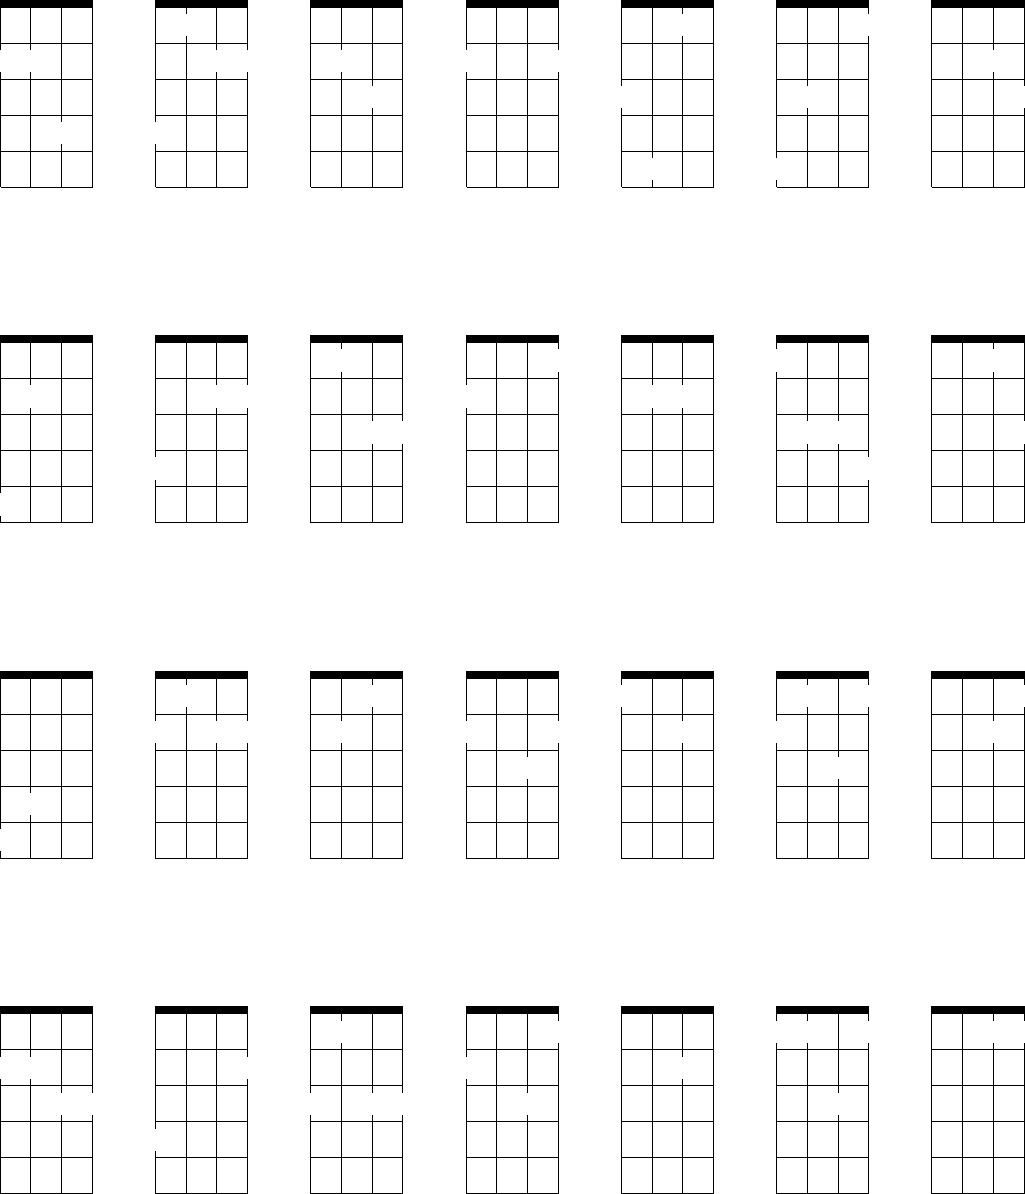 Free Mandolin Chord Chart Pdf 11kb 1 Pages A7 Diagram 2